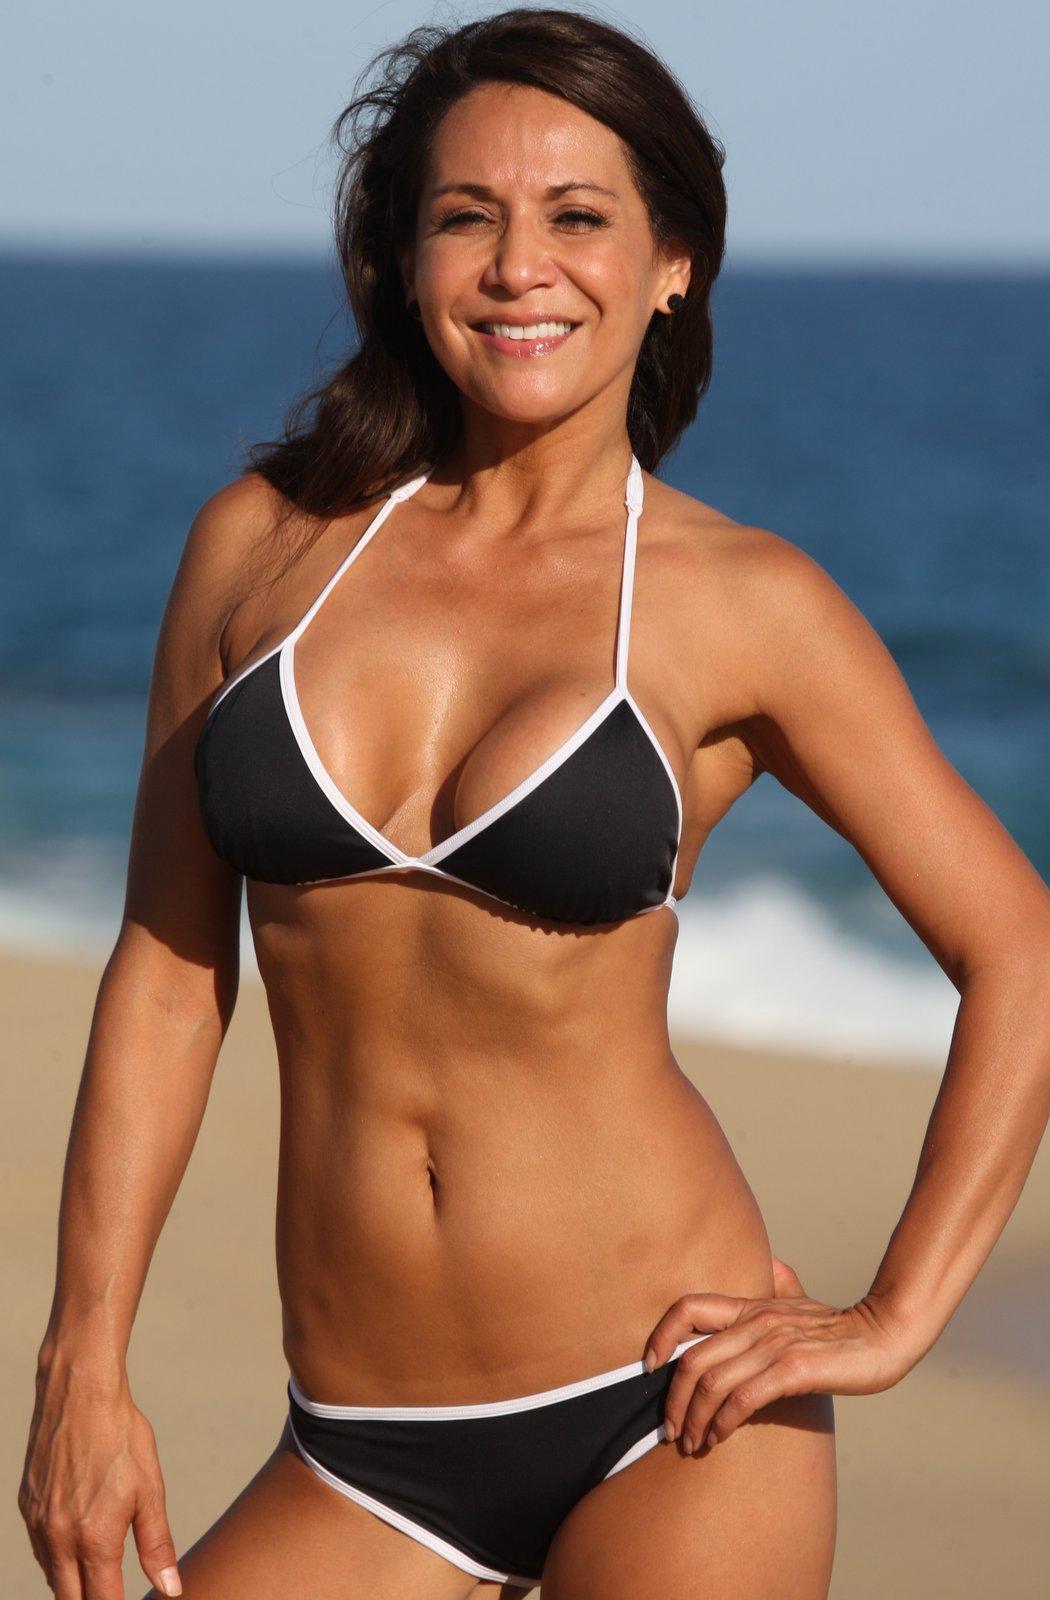 658ed6d7c05 Bikini News Daily - Rhian Sugden continues honeymoon in Sardinia